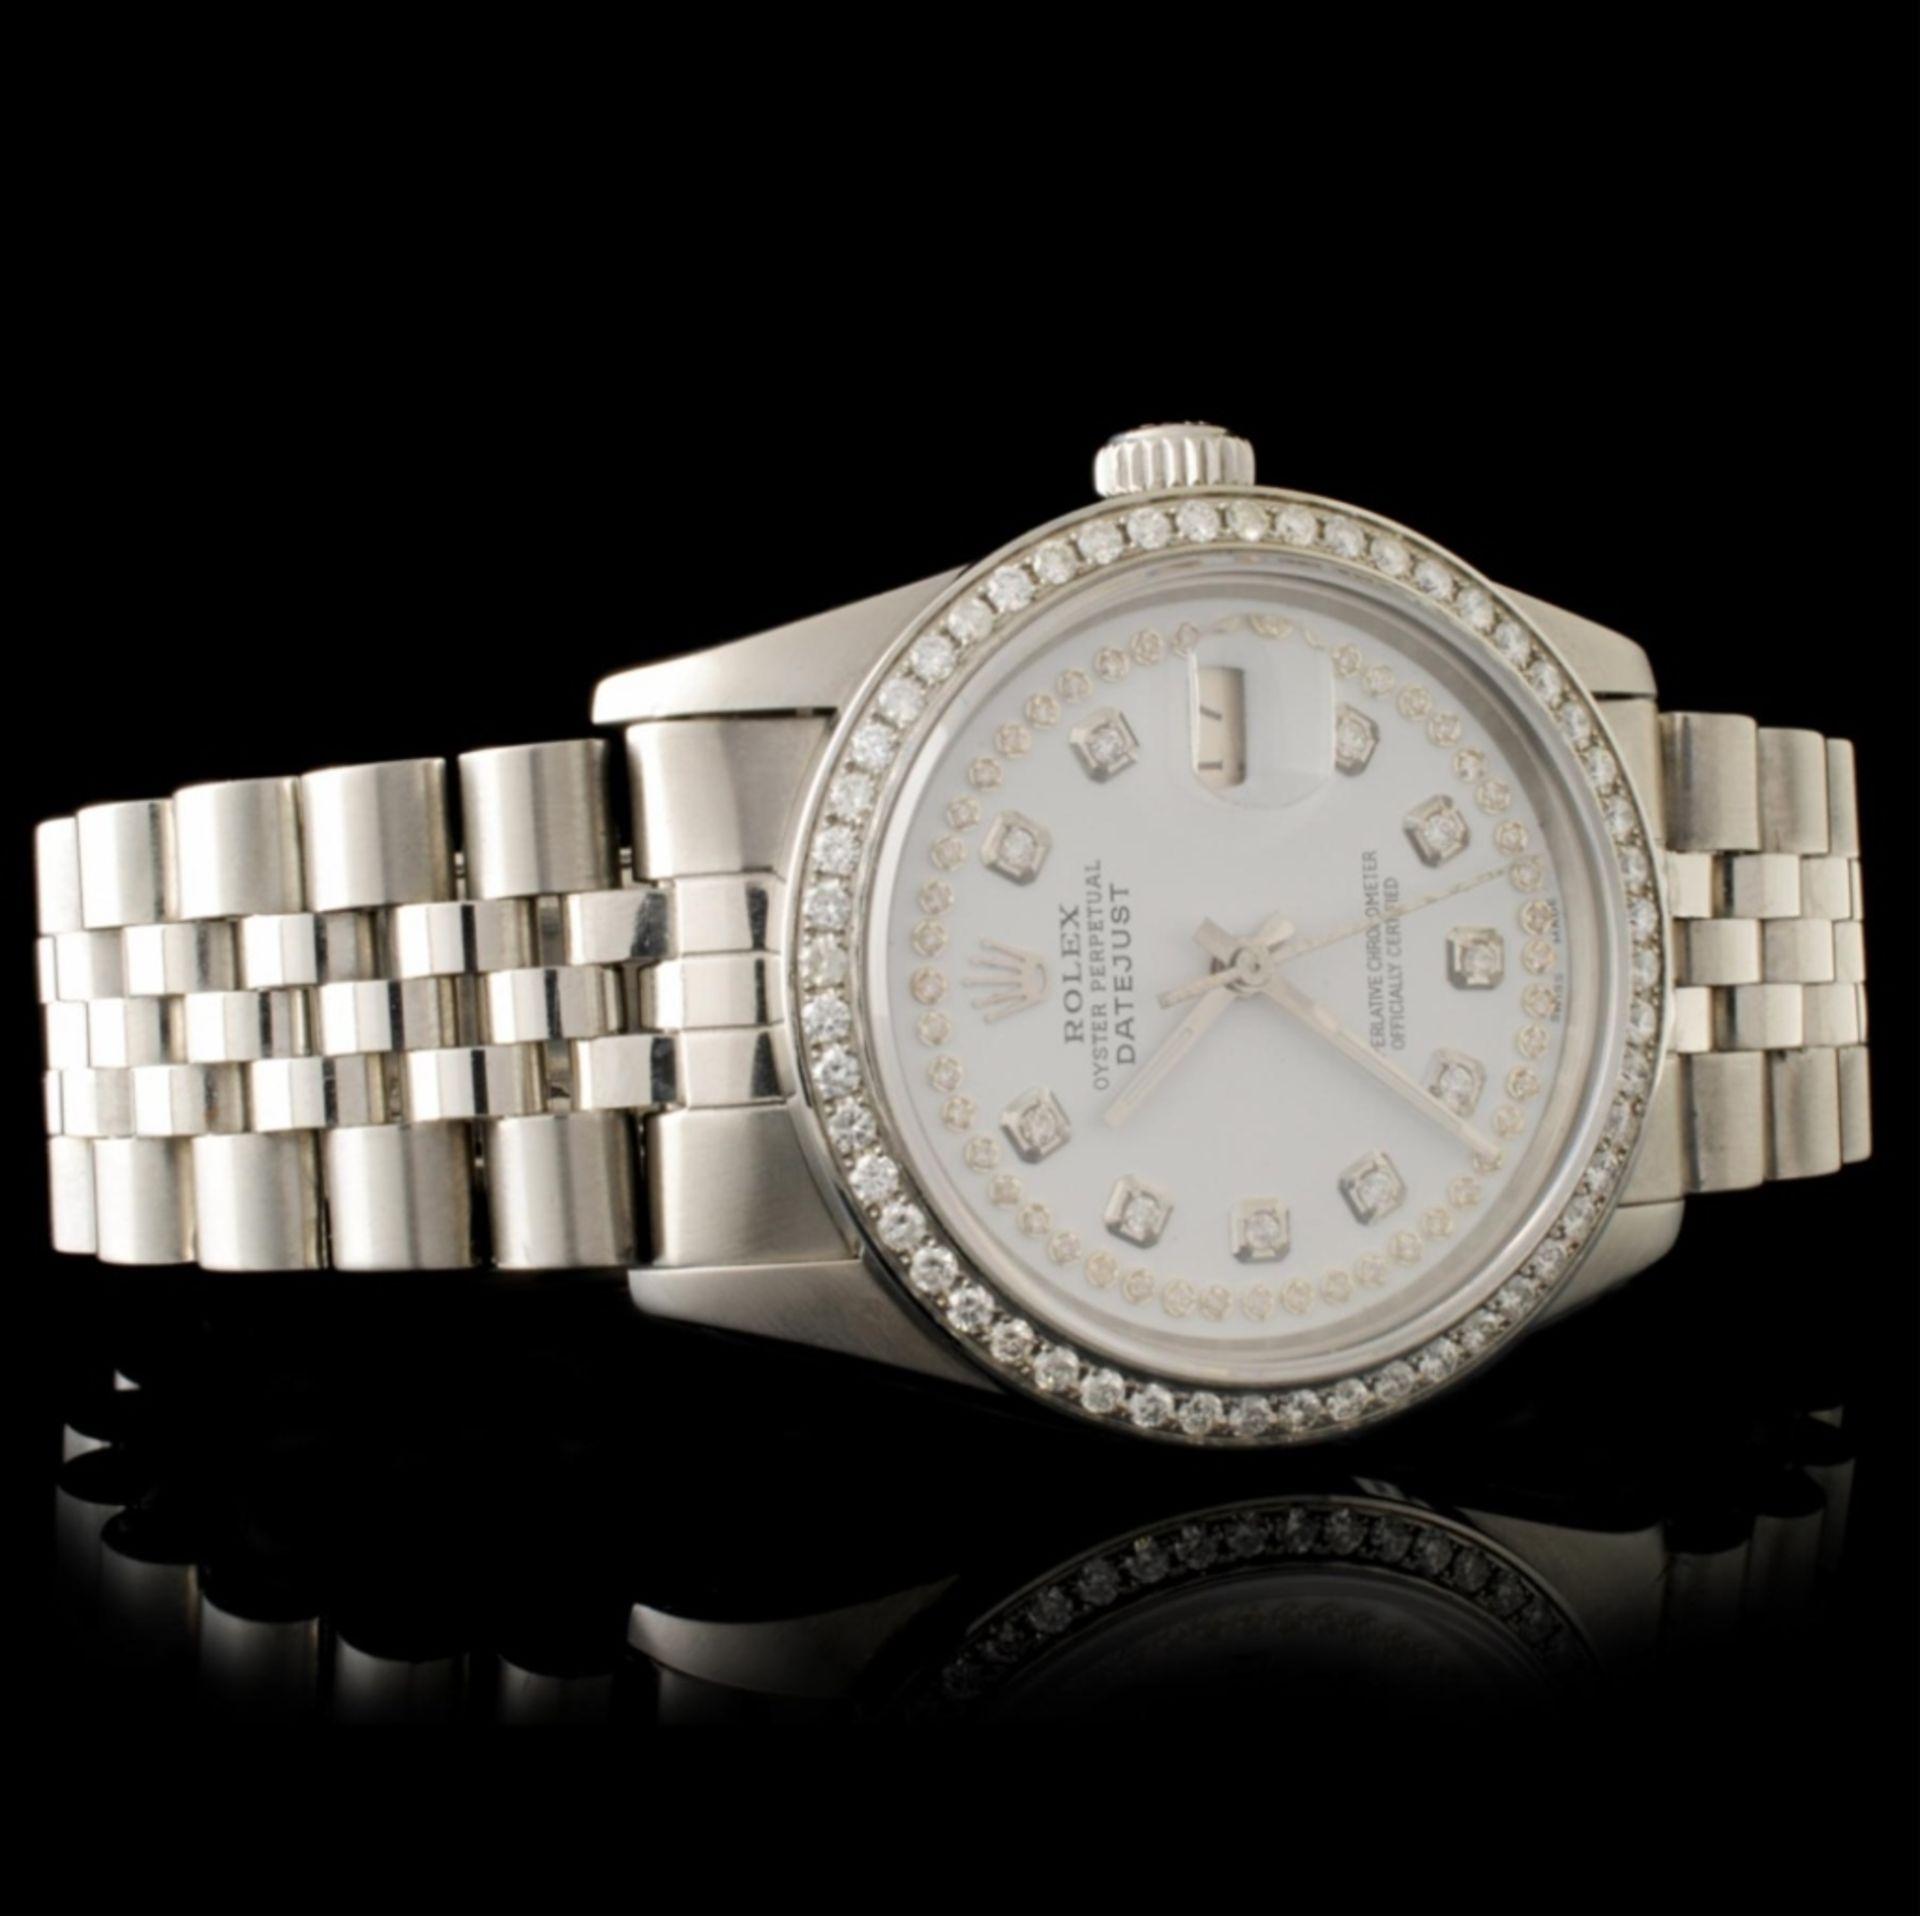 Rolex DateJust Diamond 36MM Wristwatch - Image 3 of 7